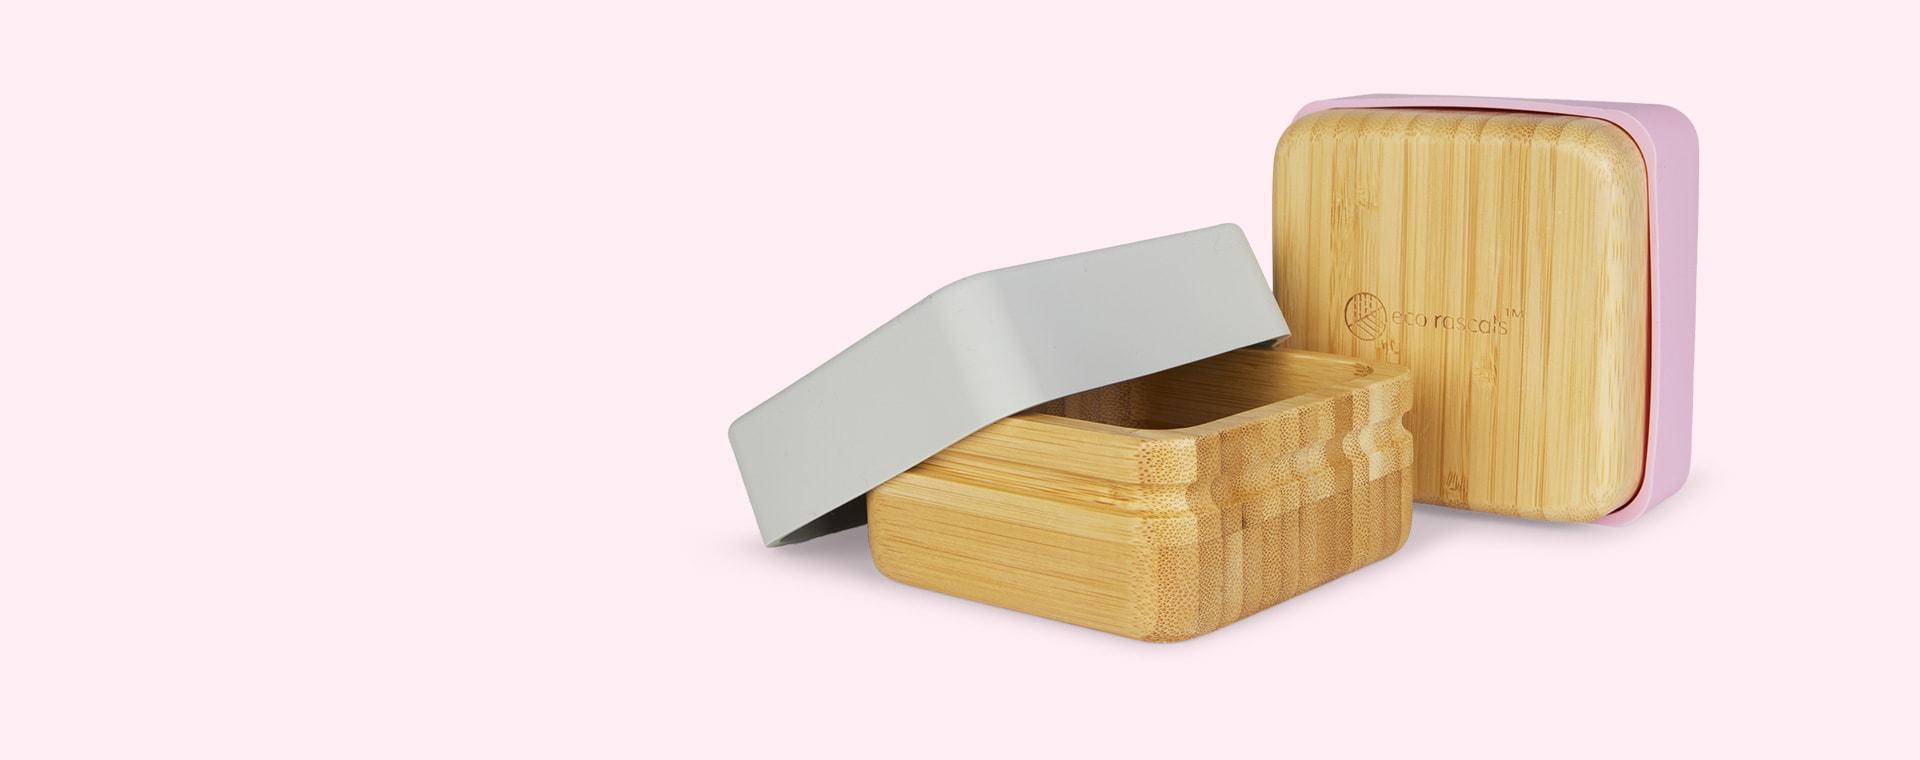 Pink/Grey eco rascals 2-Pack Snack Pots